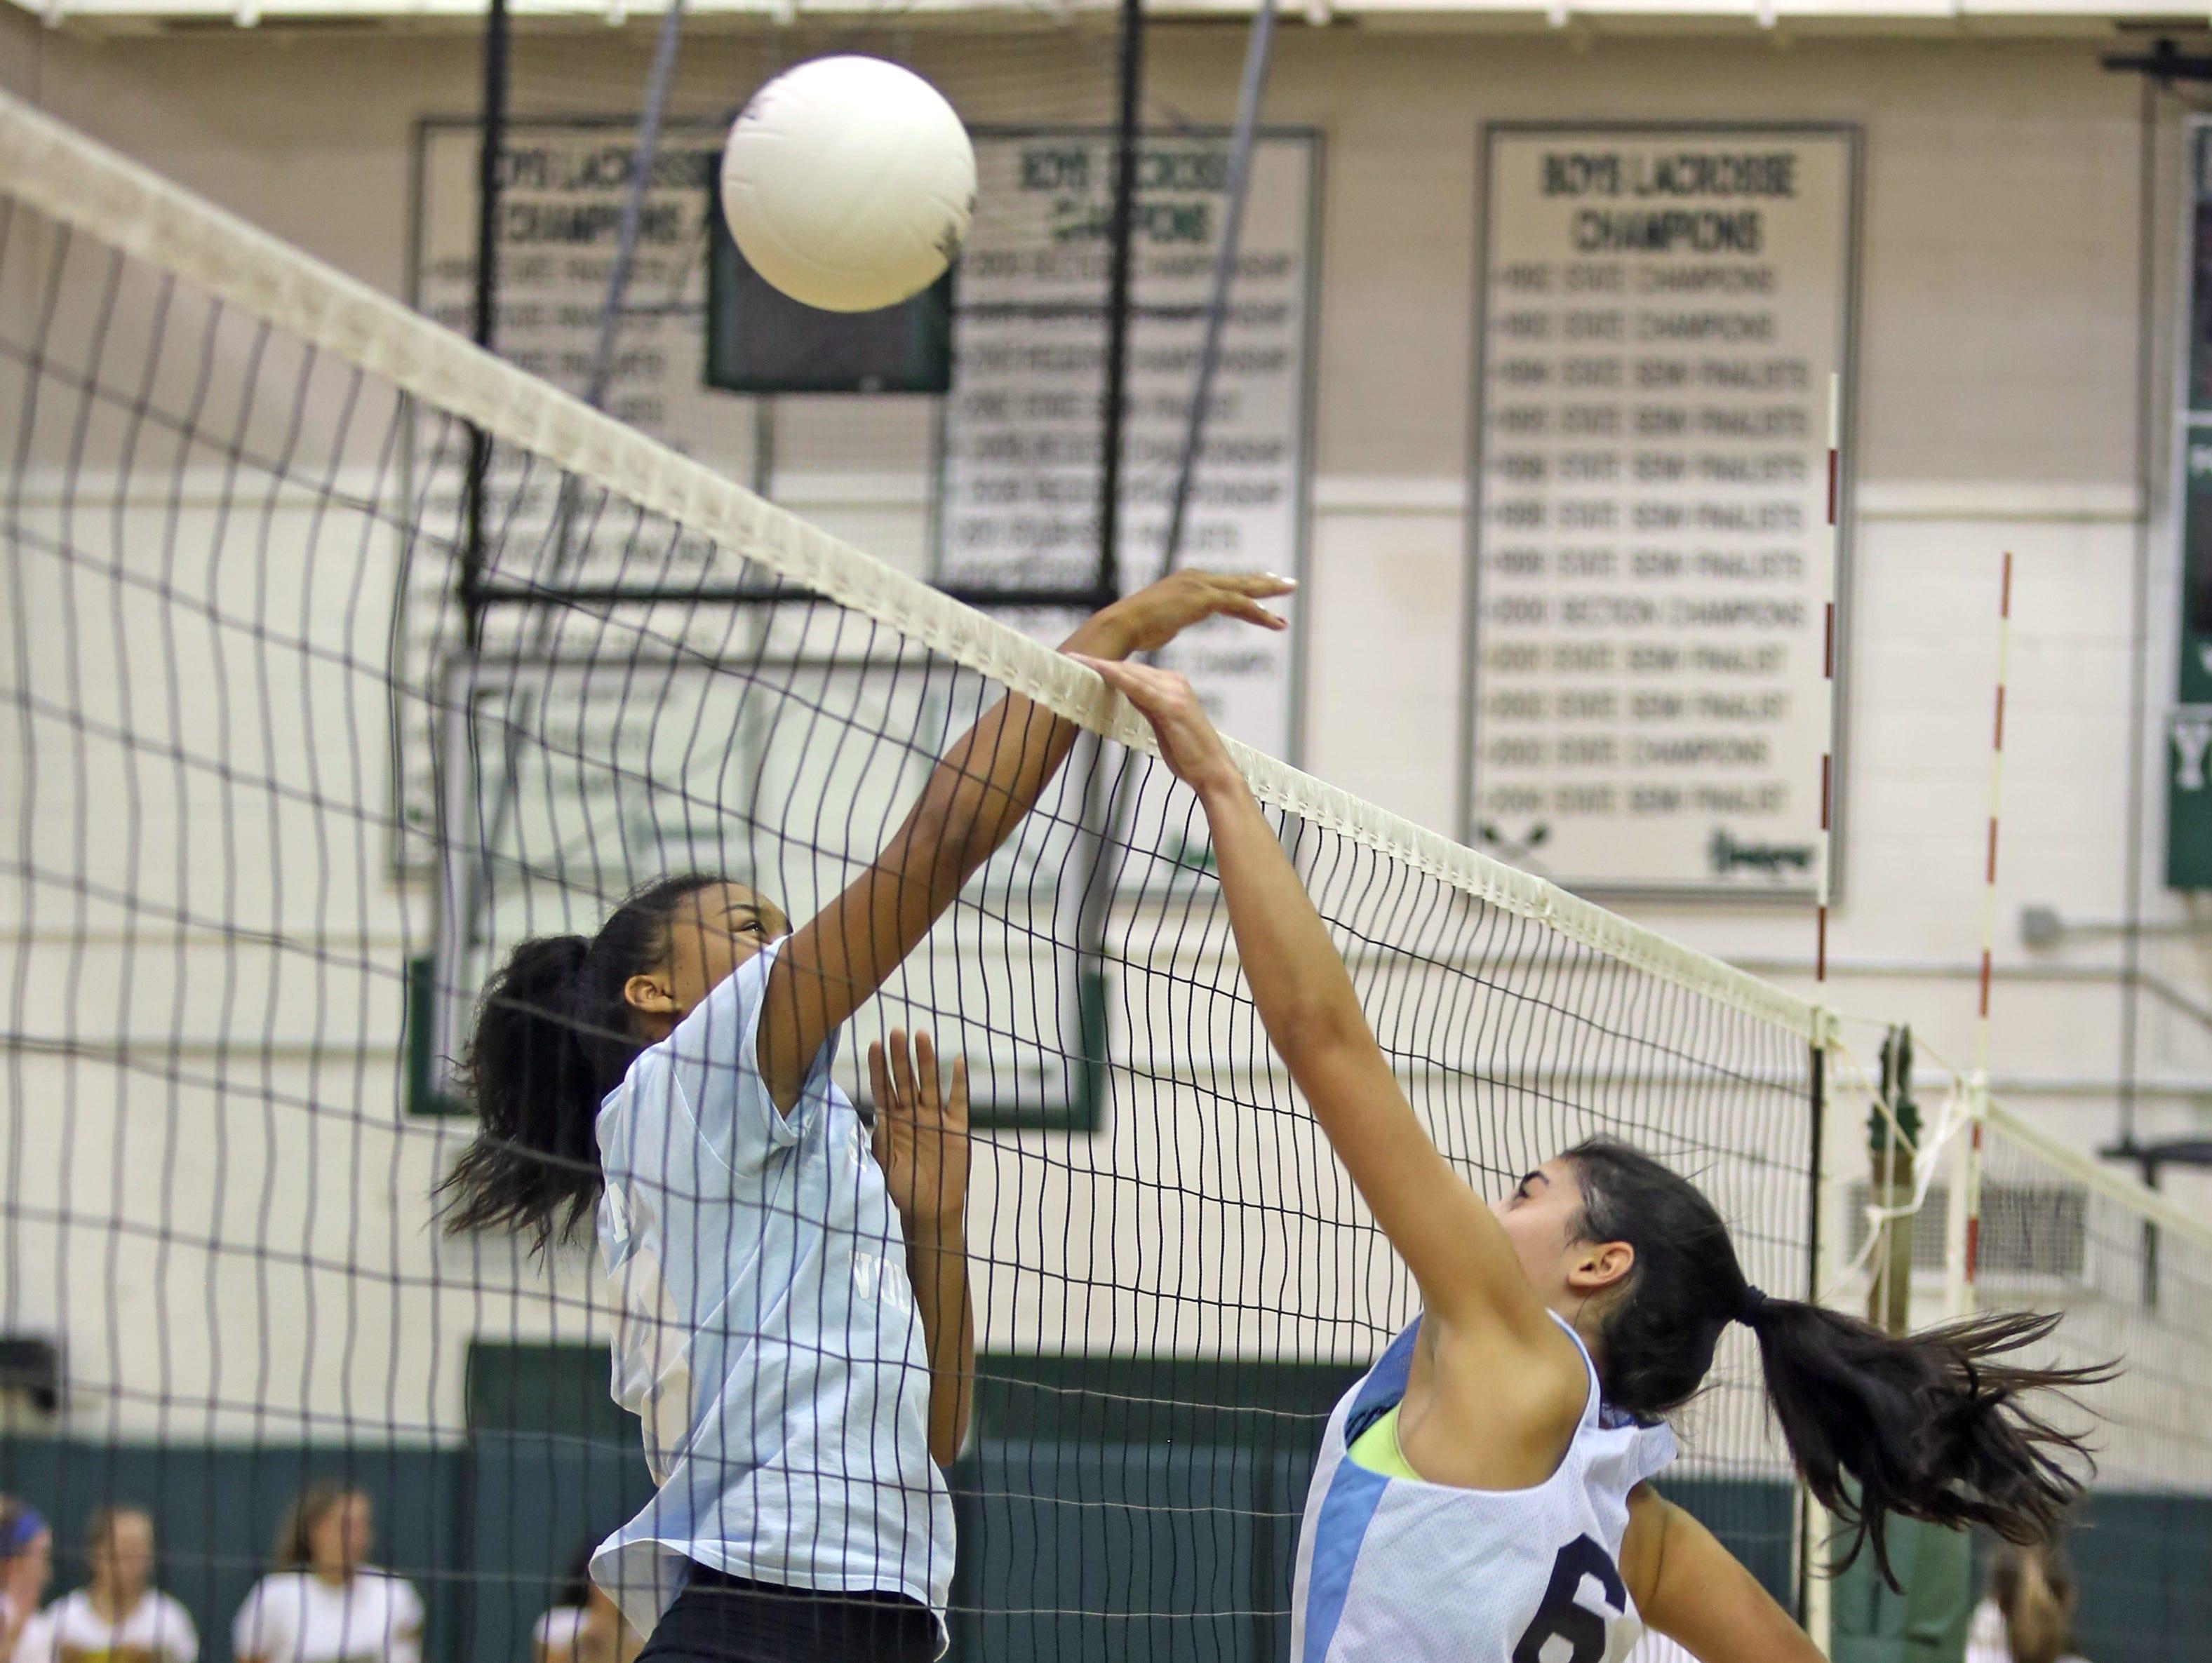 Ursuline plays Pelham High School during girls volleyball scrimmage game at Yorktown High School on Tuesday, Aug. 30, 2016.